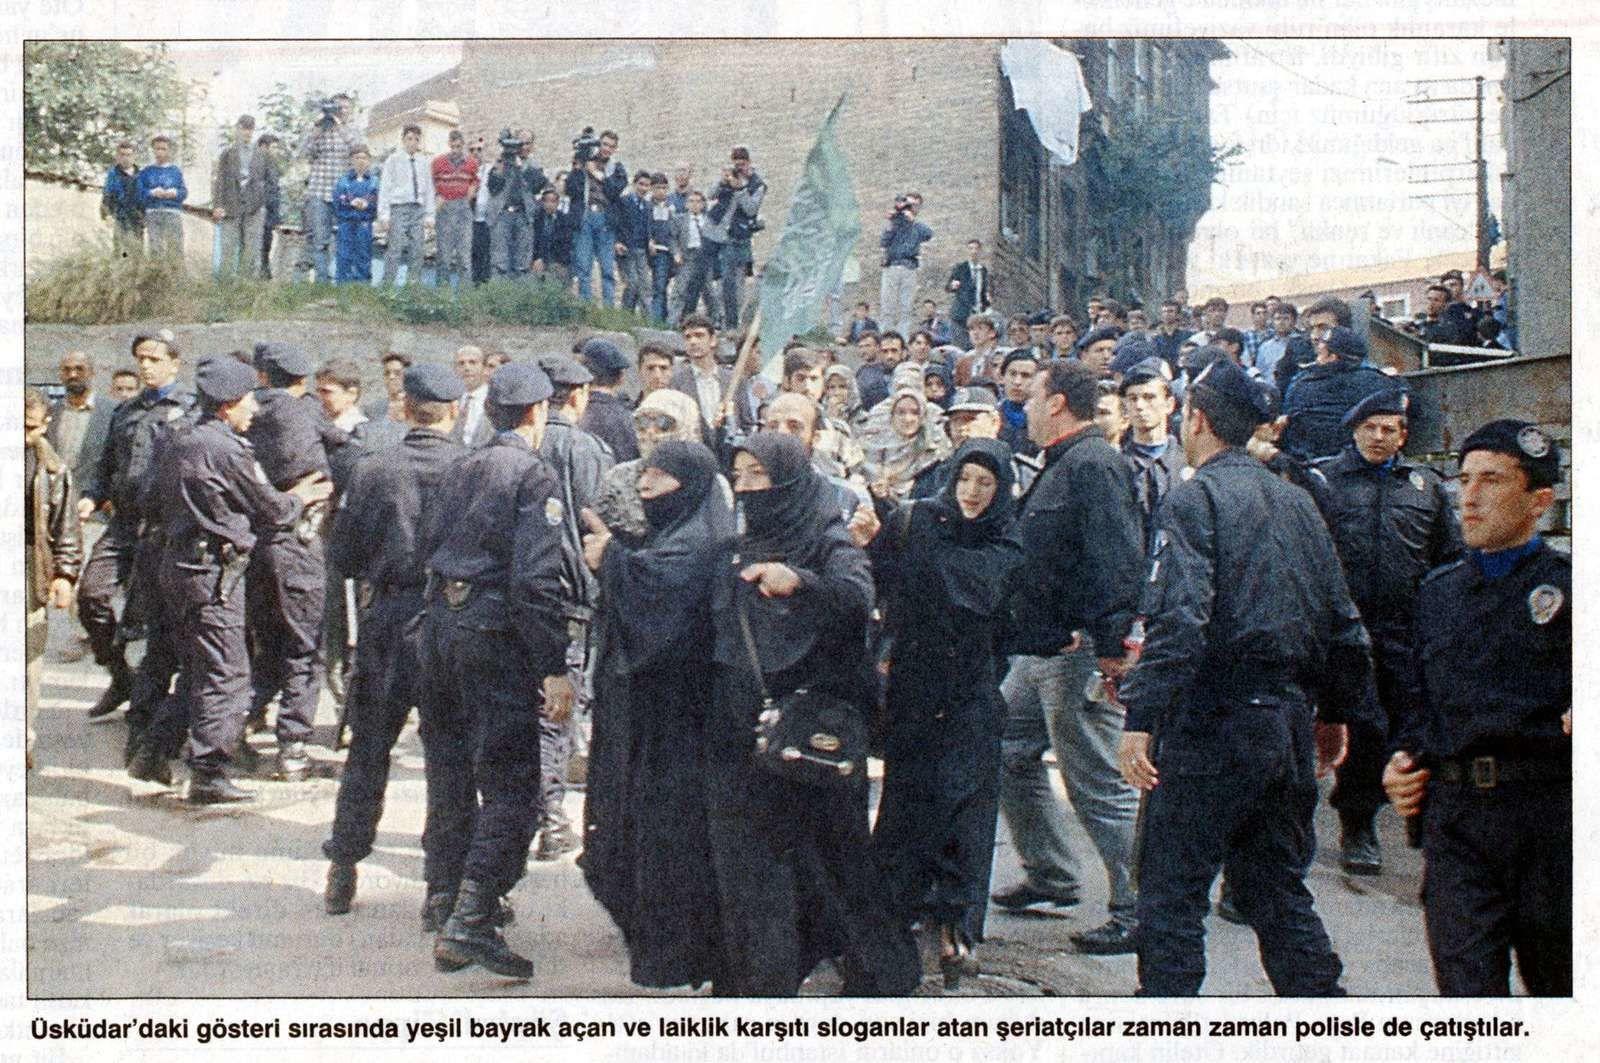 Photo Yeni Yüzyıl, sans mention d'auteur, 11 octobre 1996